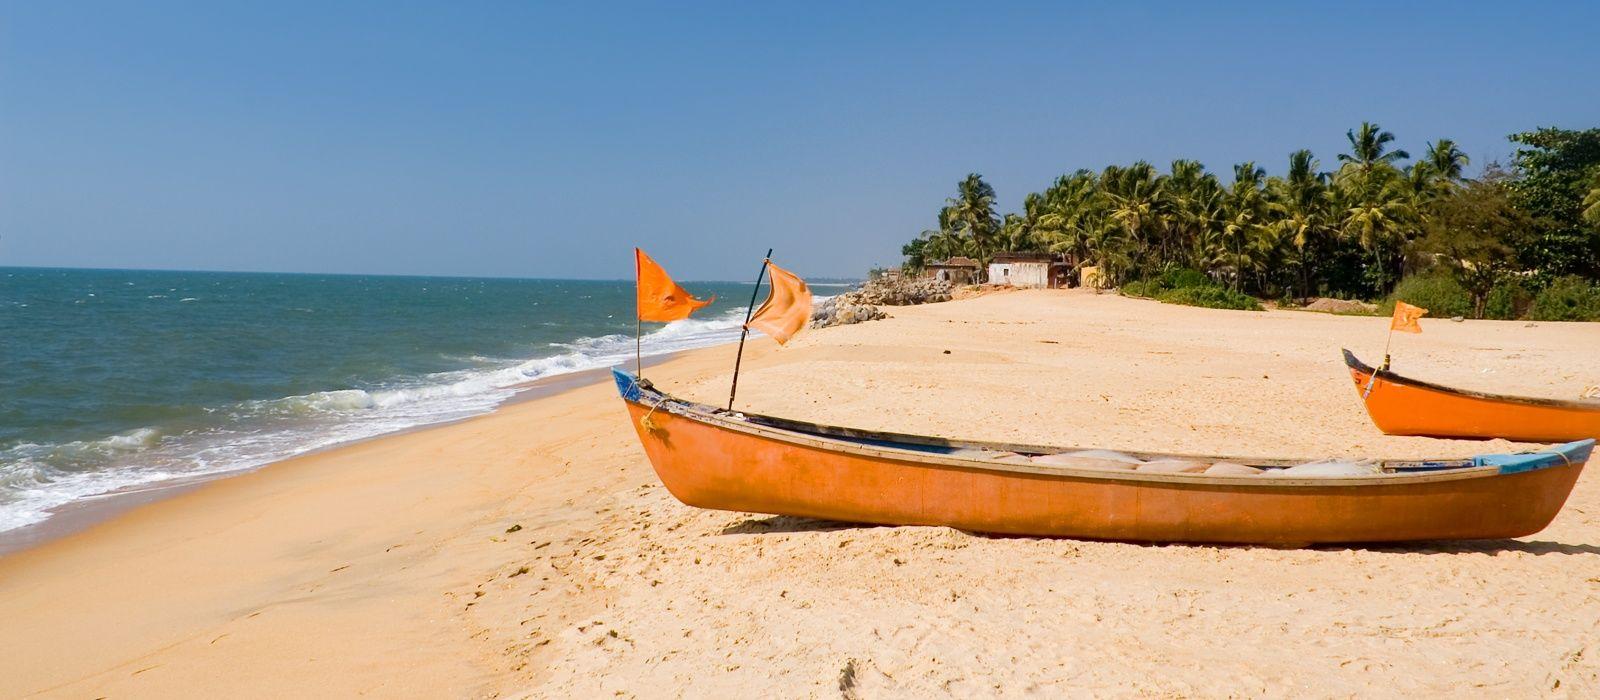 Destination Mangalore South India